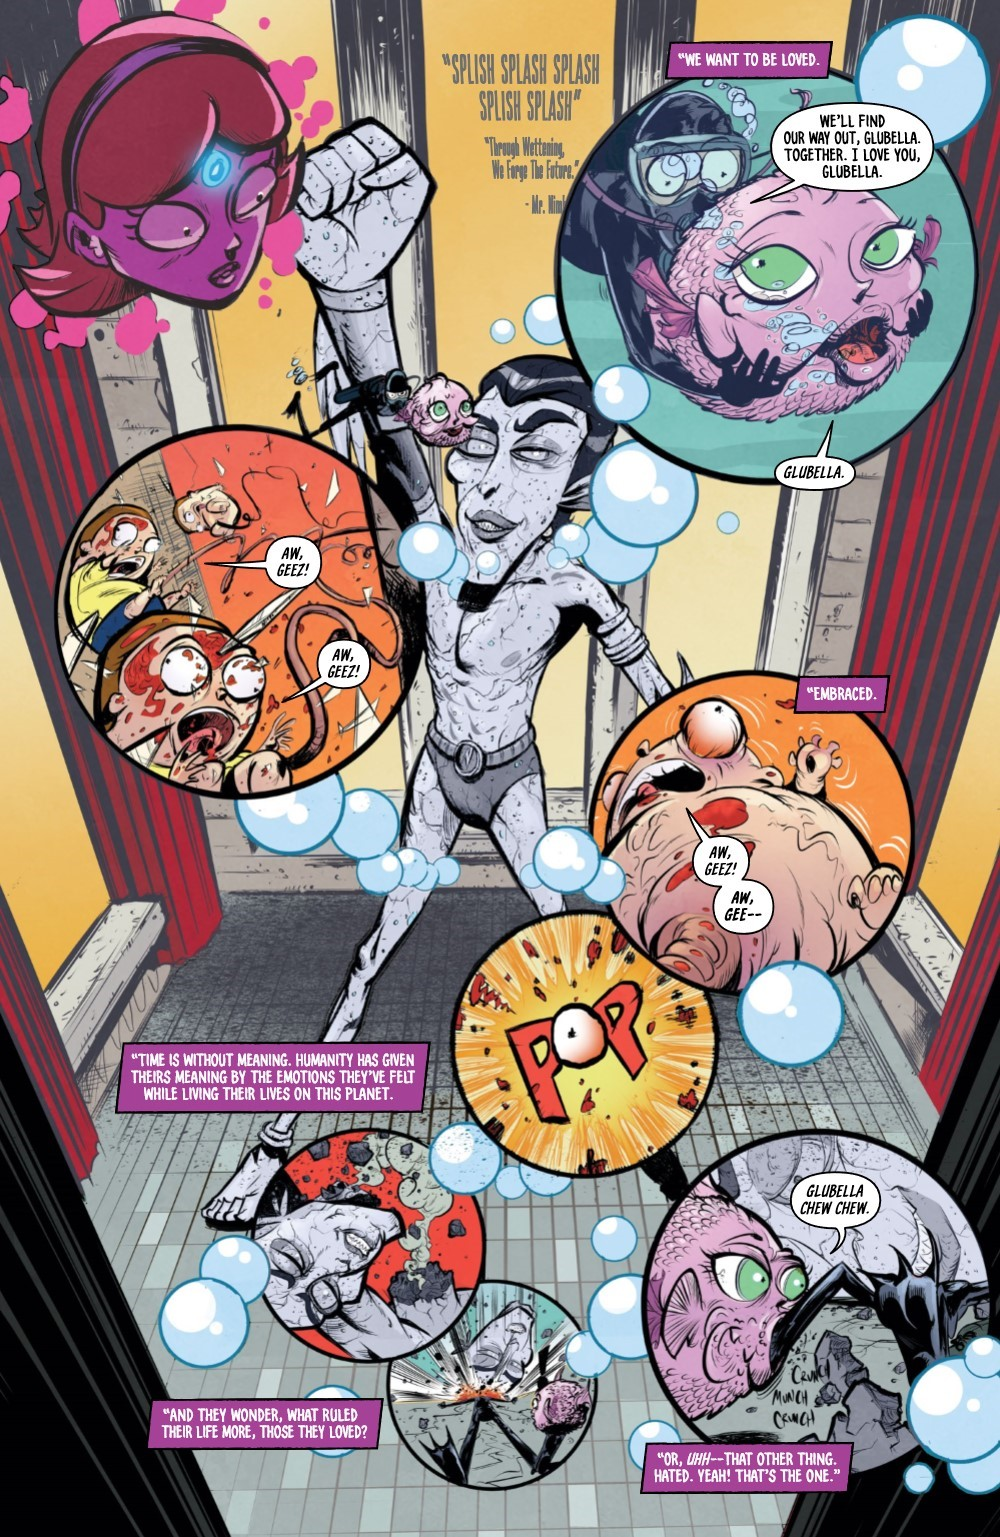 RM-MRNIMBUS-1-REFERENCE-05 ComicList Previews: RICK AND MORTY MR. NIMBUS #1